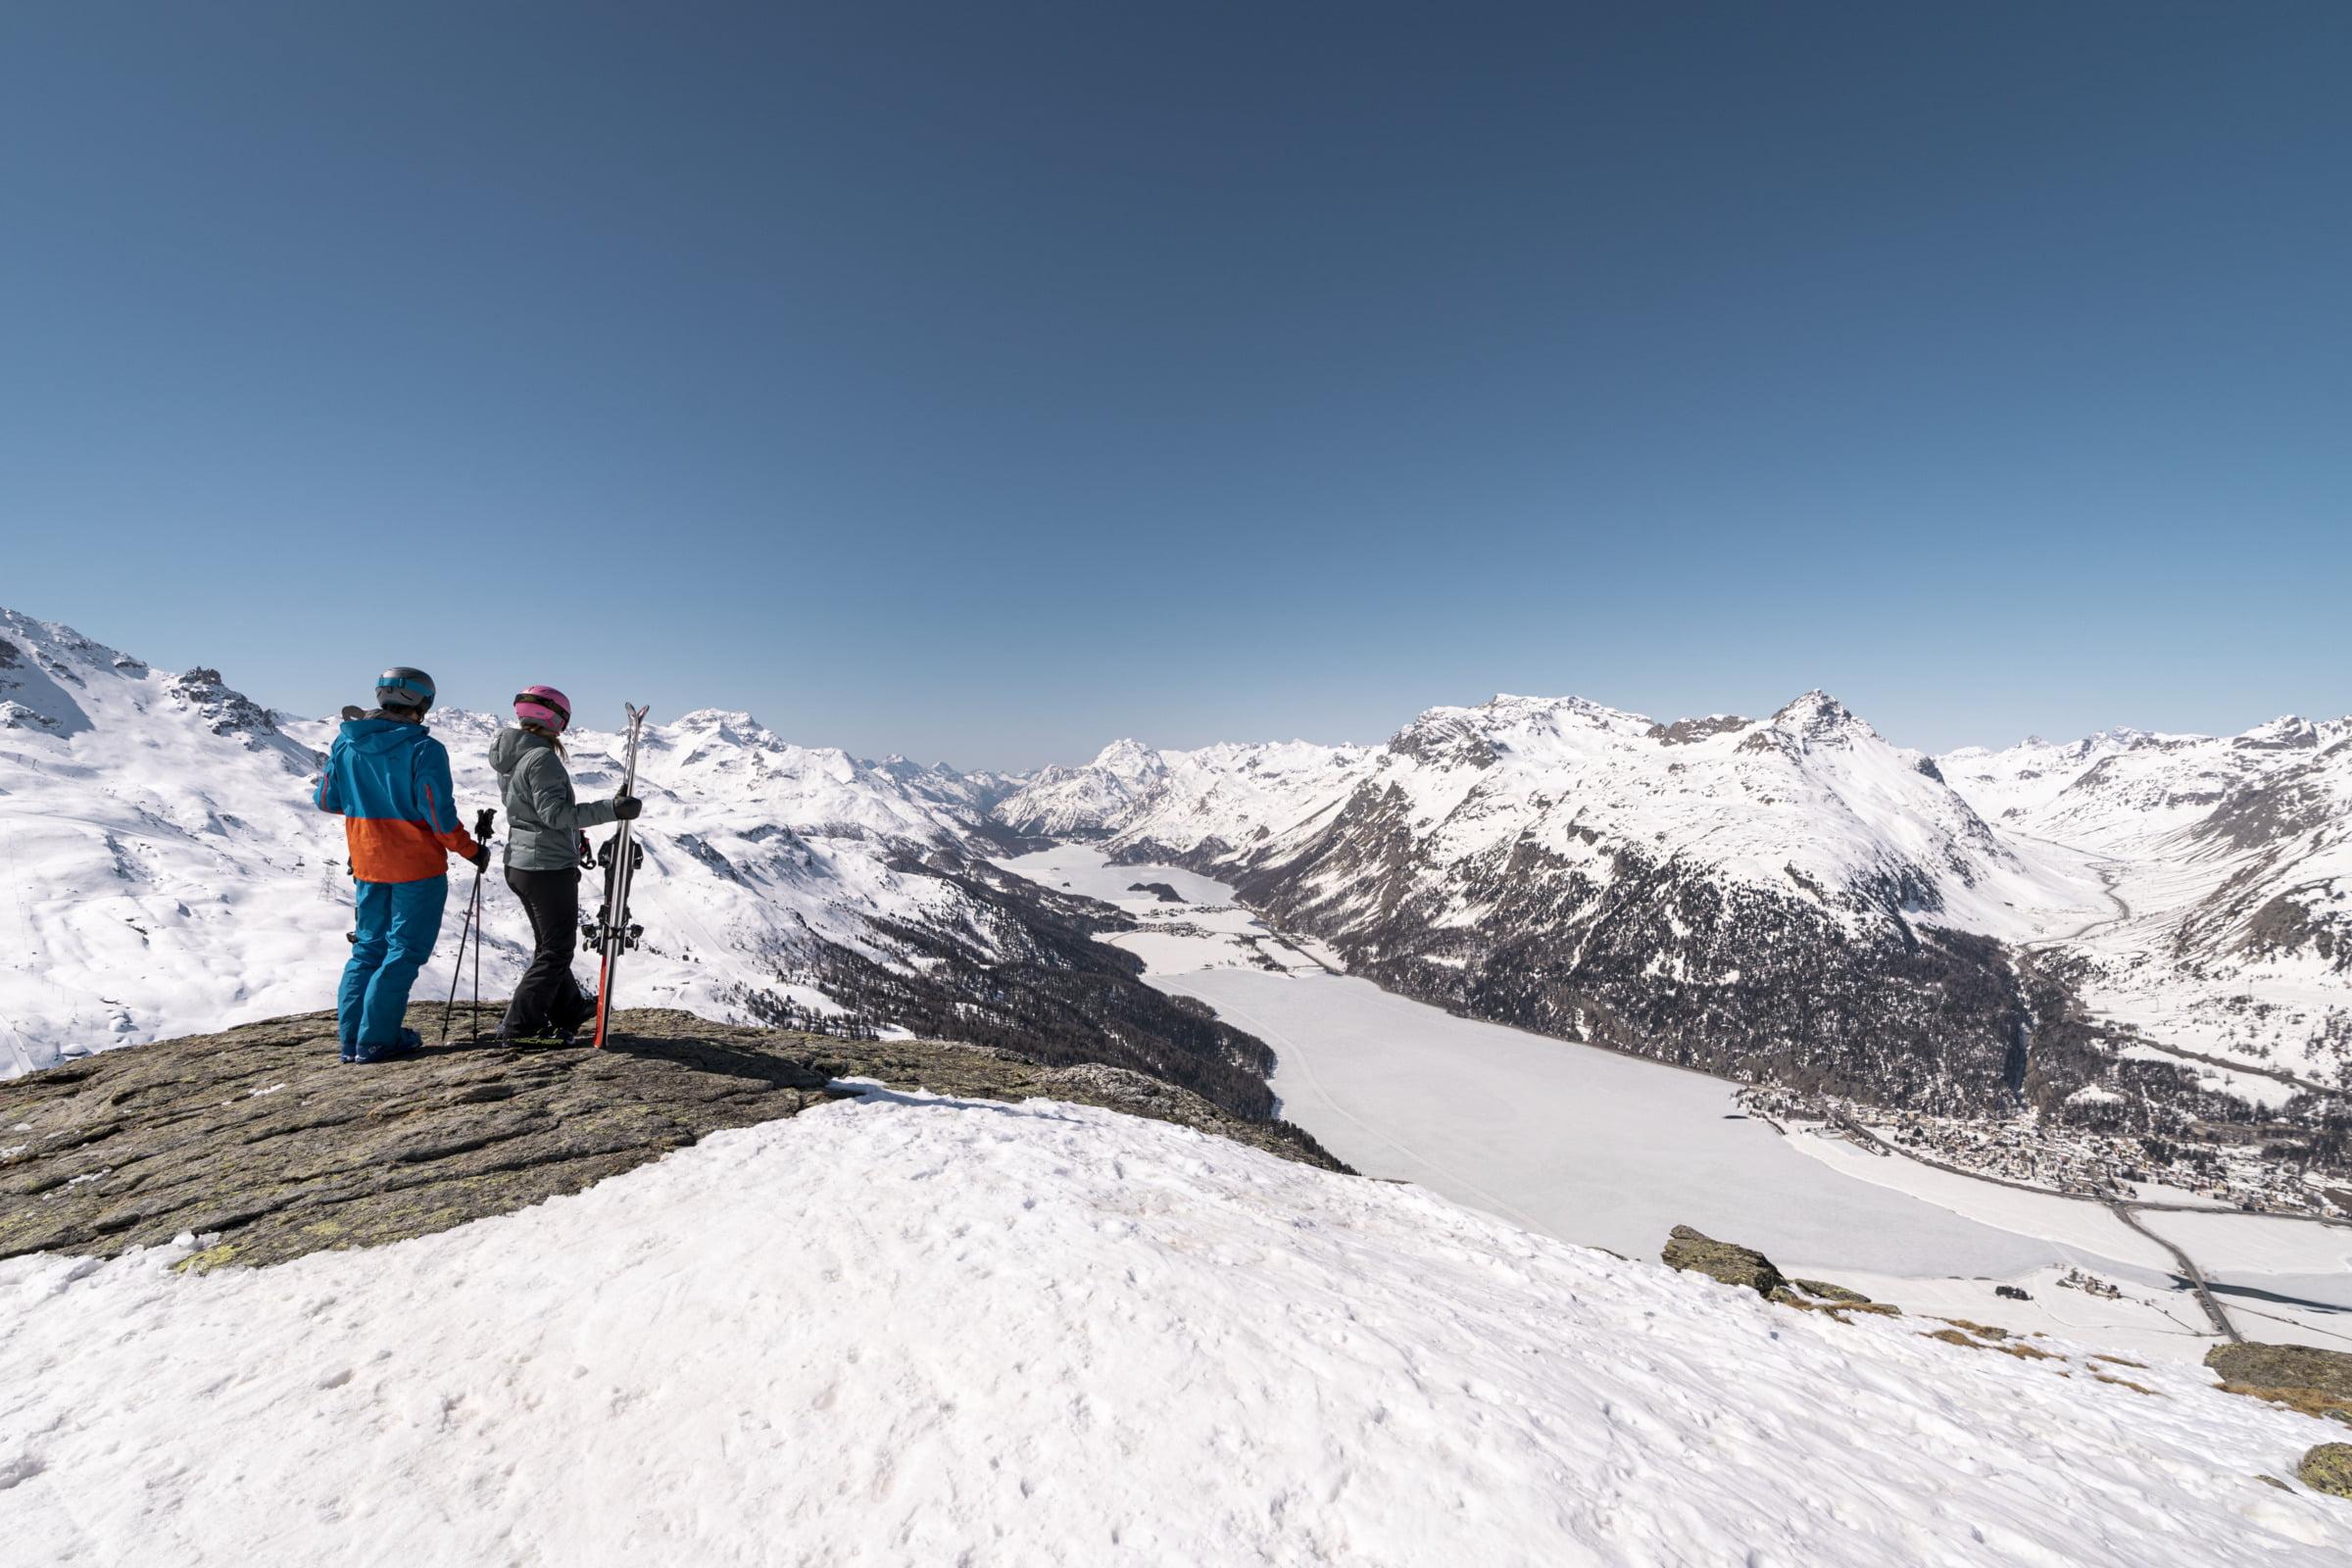 99 km of piste, 6,666 vertical metres, 22 mountain huts